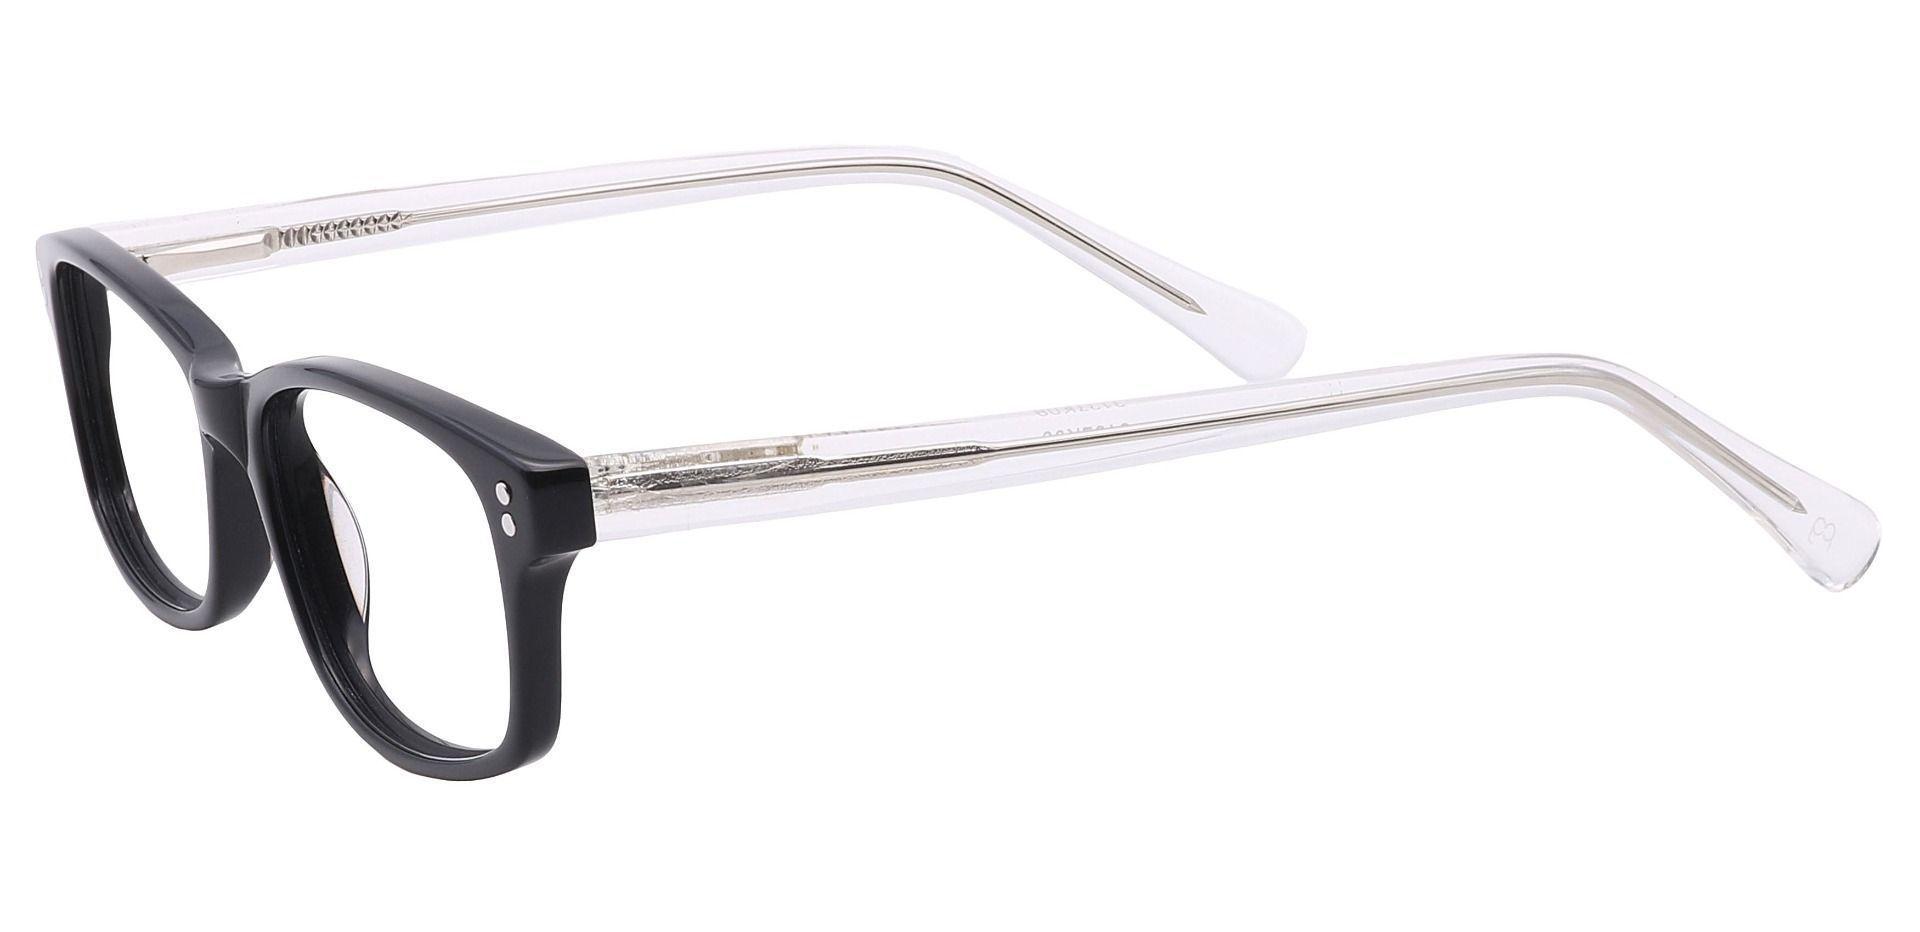 Olmstead Rectangle Prescription Glasses - Black